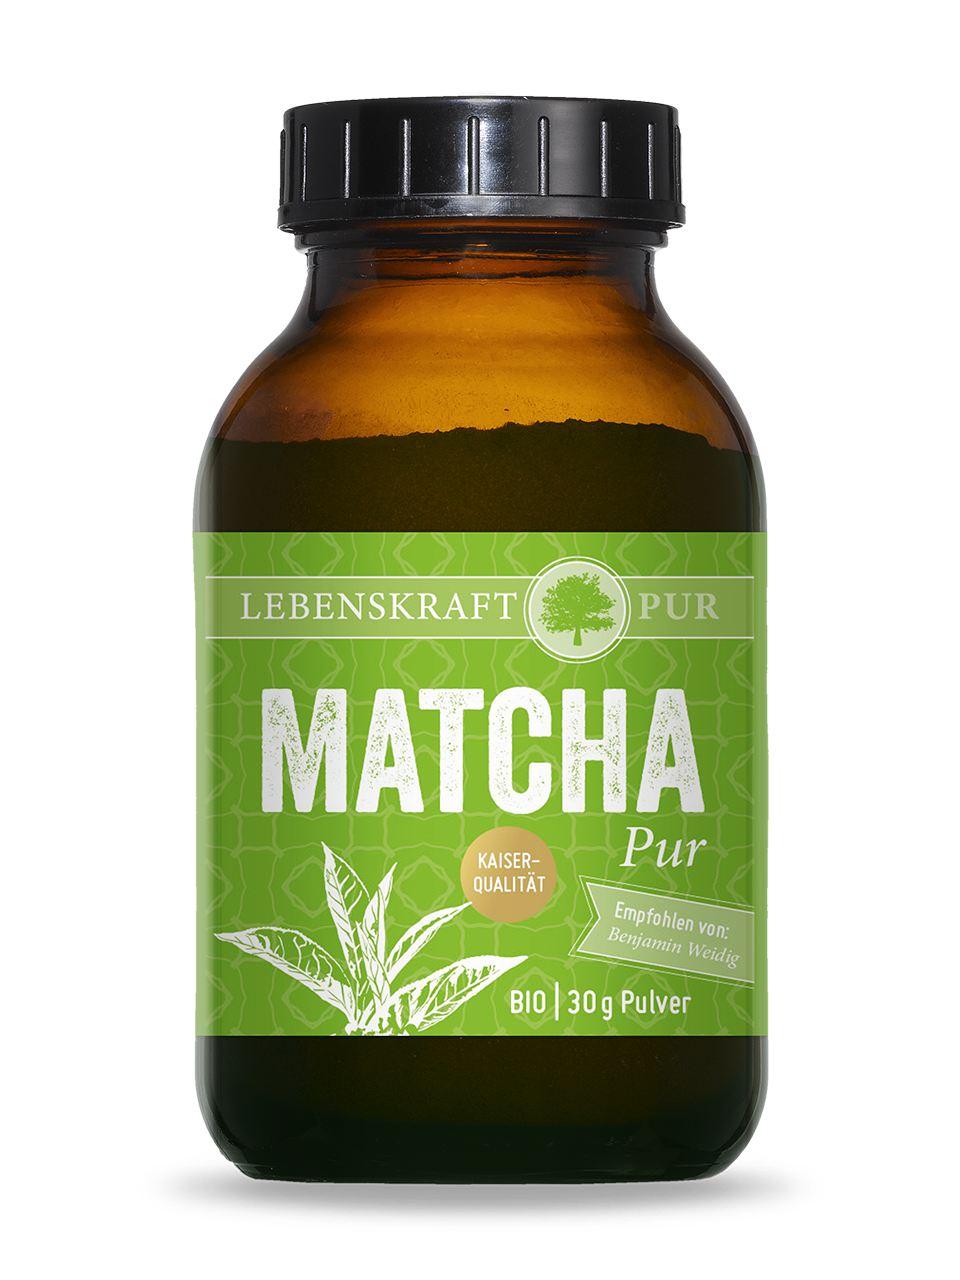 Bio Matcha Pur - Lebenskraftpur